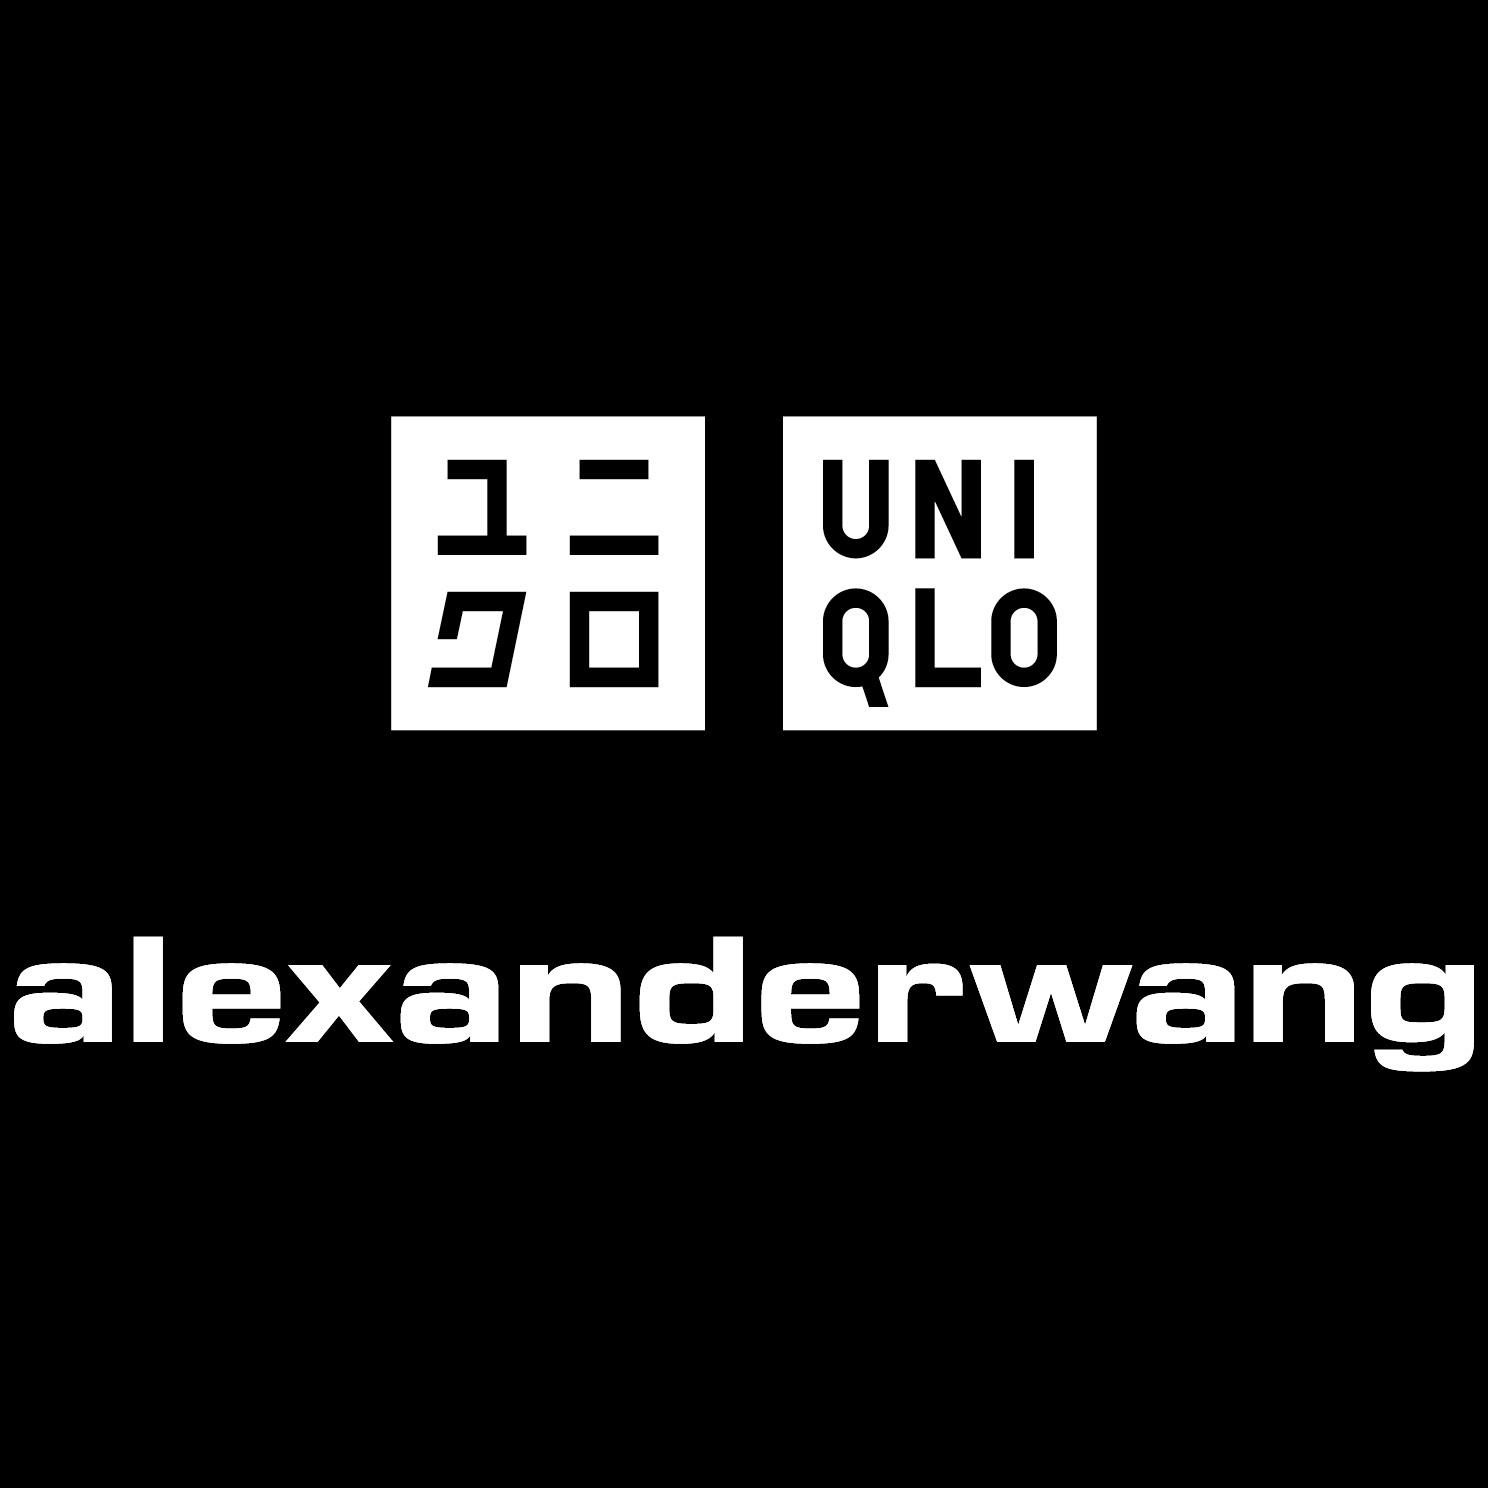 UNIQLO x ALEXANDER WANG 2018 秋冬 HEATTECH 系列官方訊息釋出!